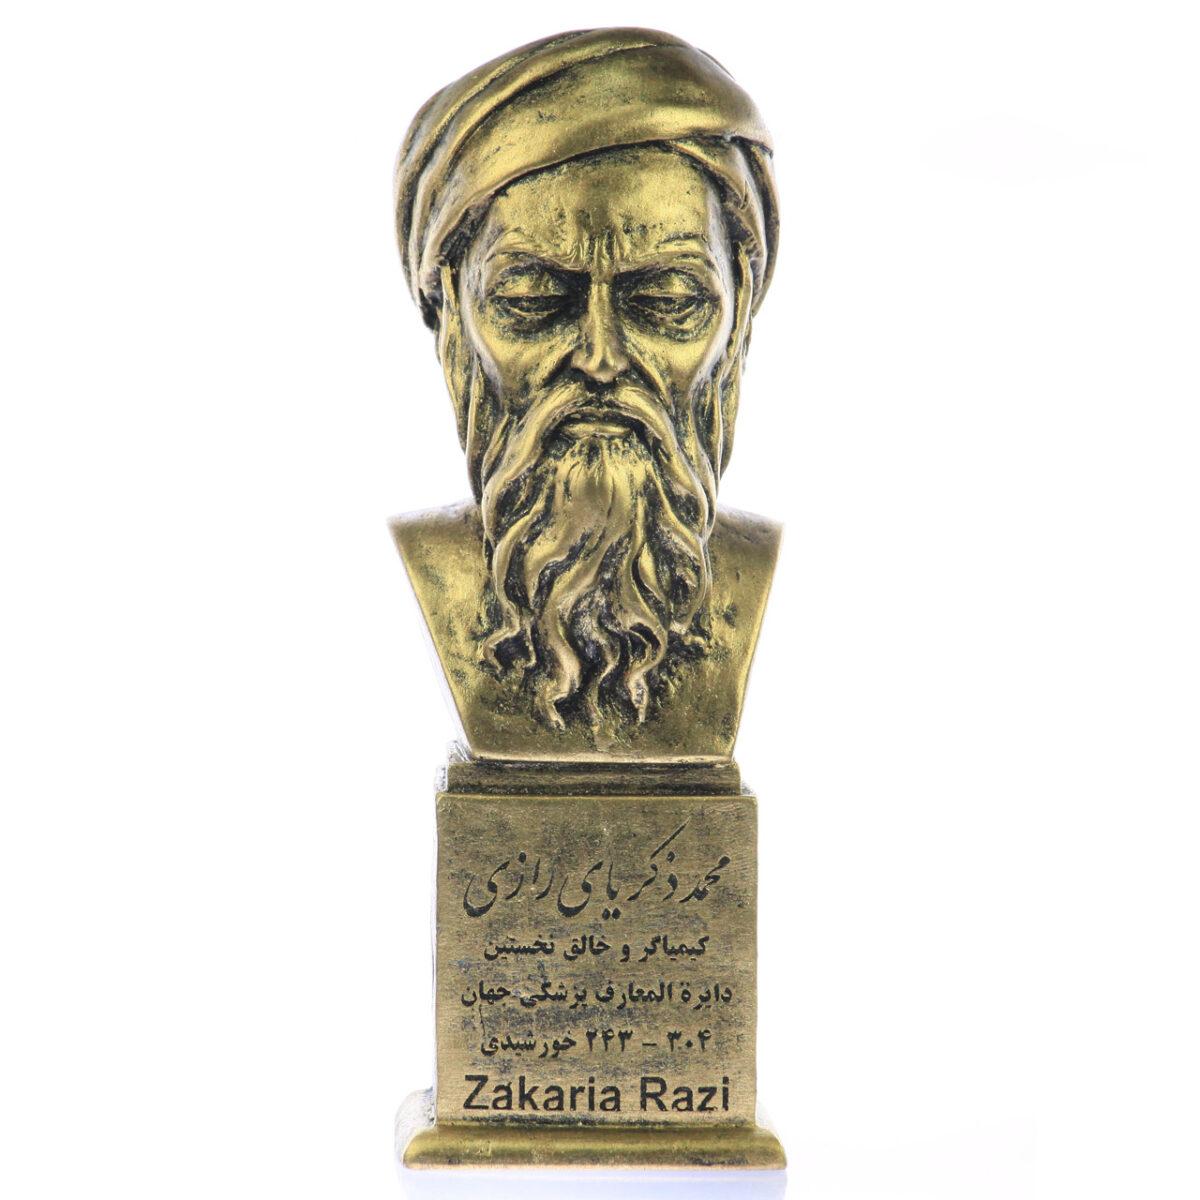 razi b 1200x1200 - سردیس محمد بن زکریای رازی